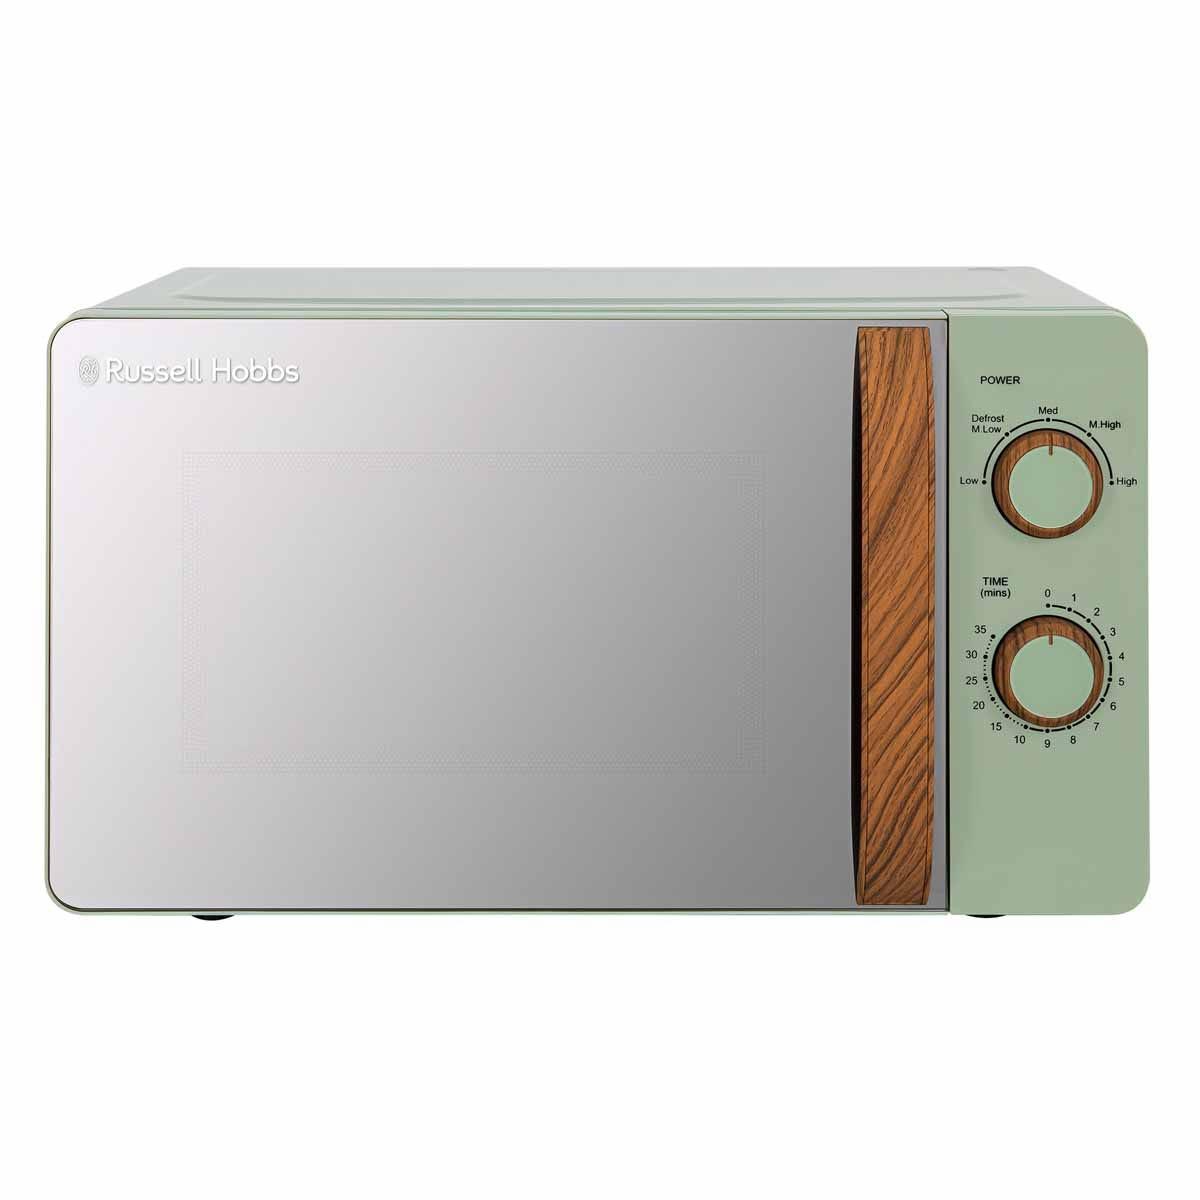 Russell Hobbs RHMM713MG-N 17L 700W Manual Microwave - Matt Green with Wooden Effect Handle